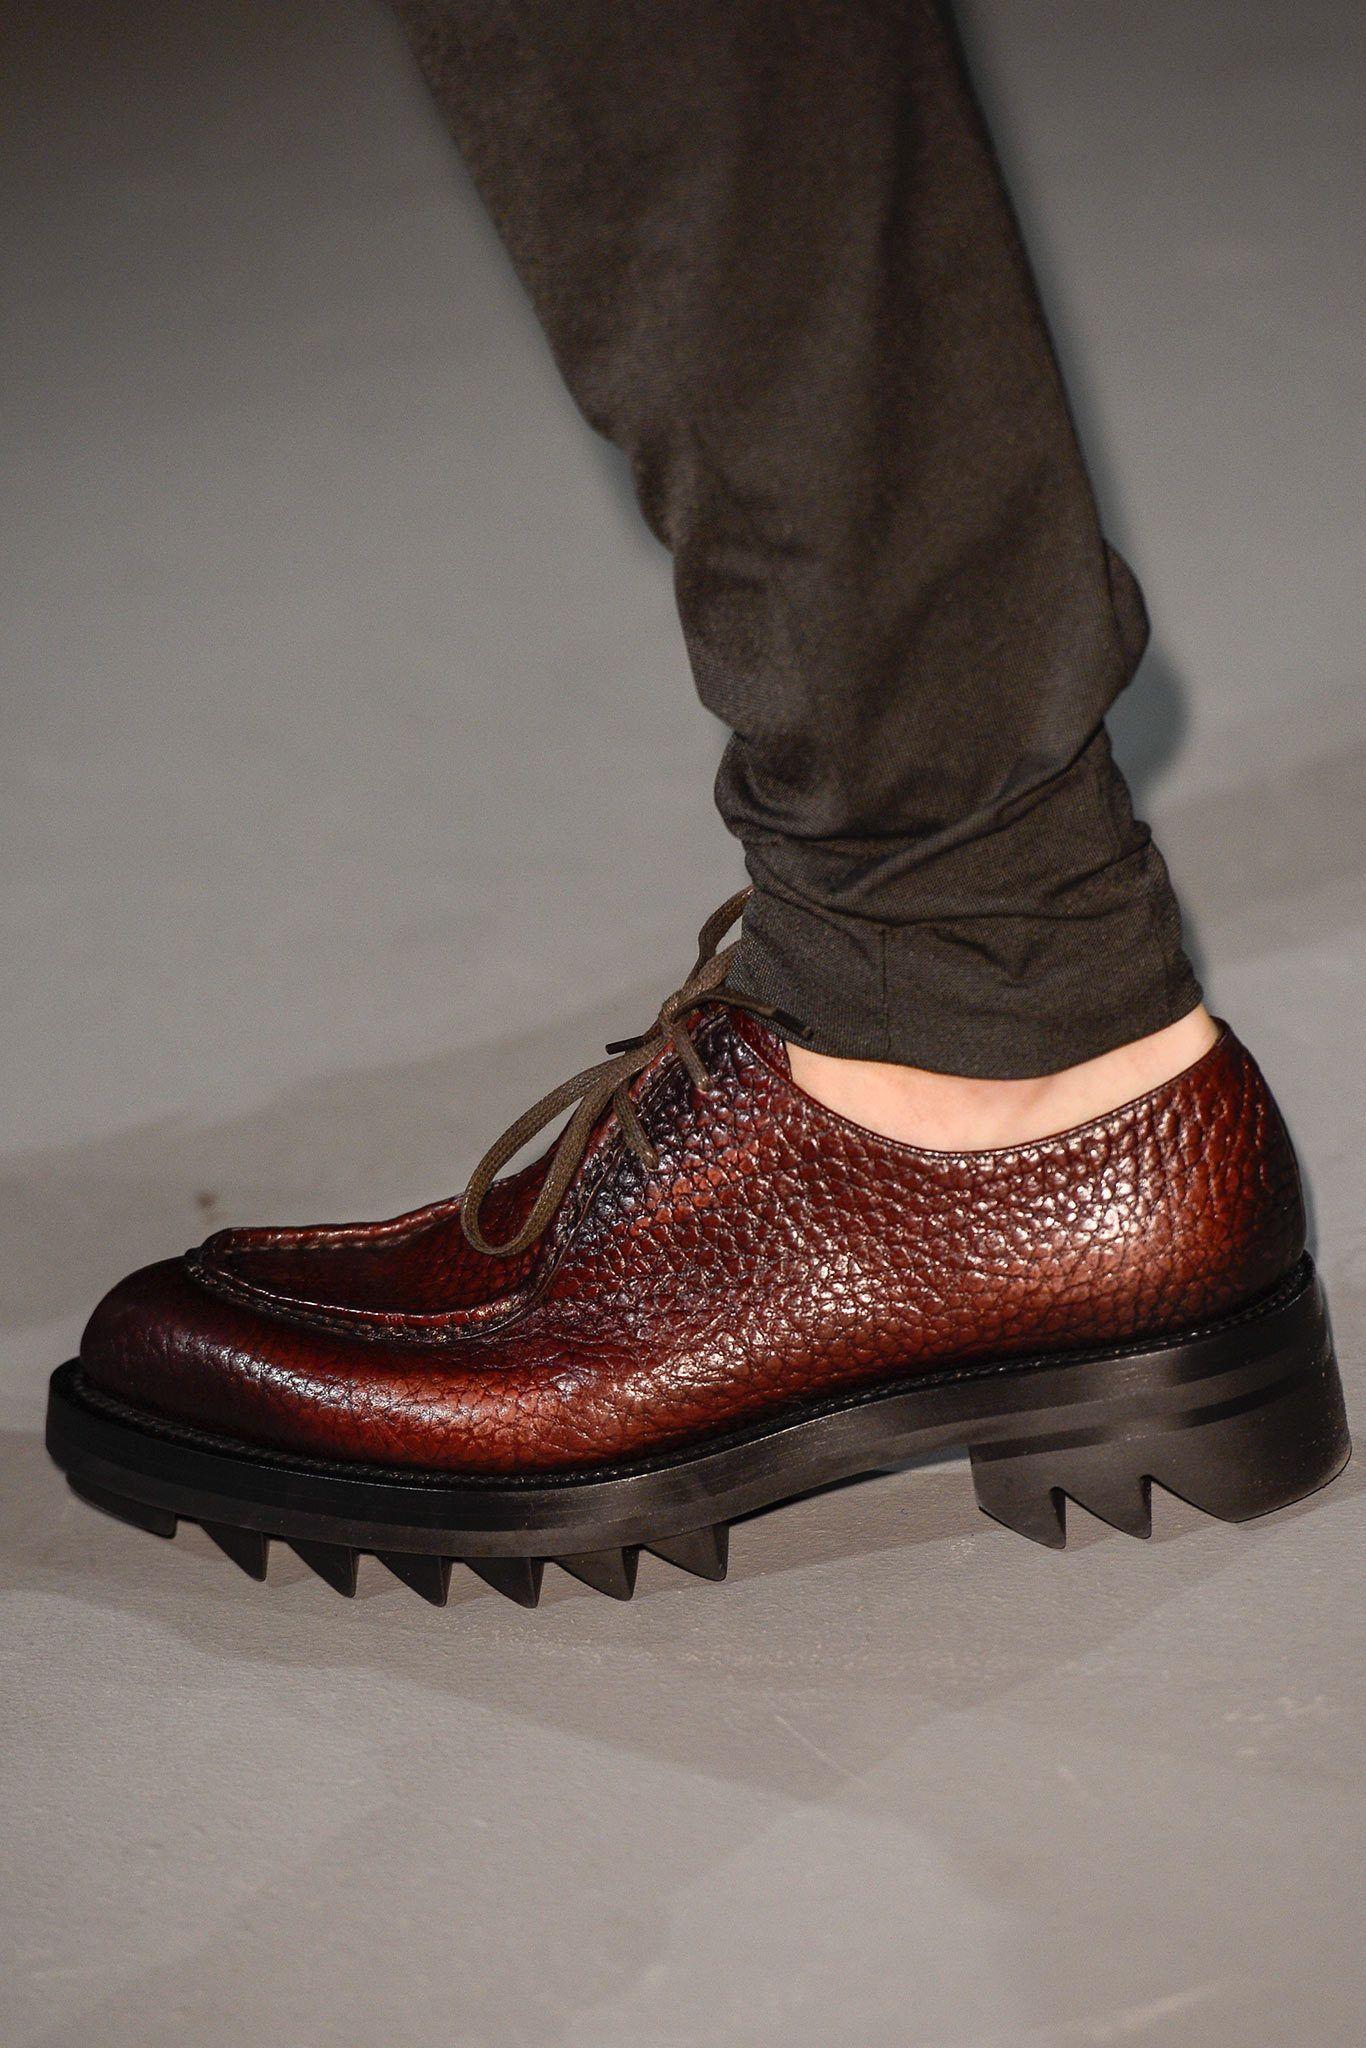 PRADA FW 2013 MEN | Prada men shoes, Best shoes for men